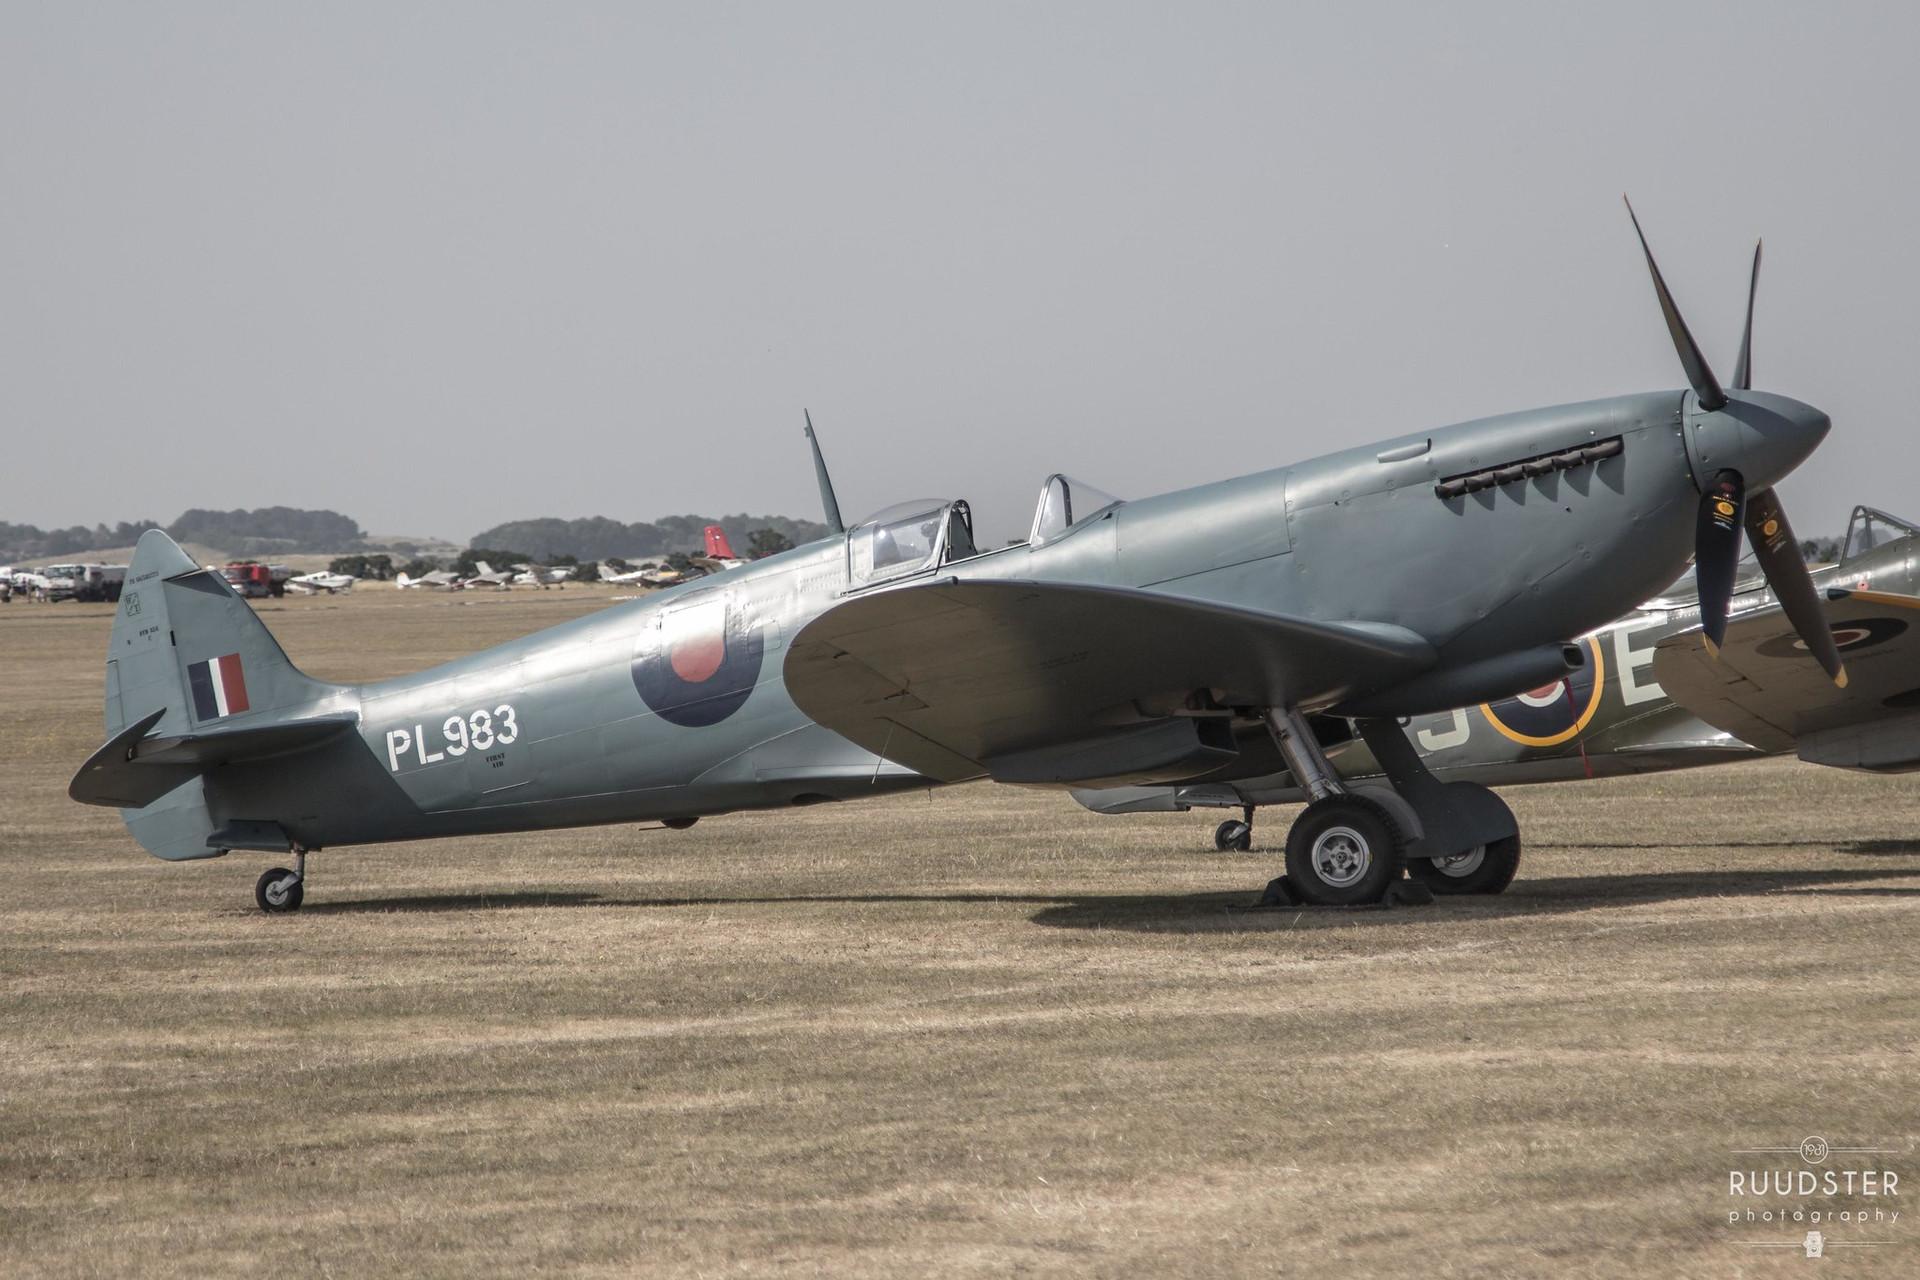 PL983 / G-PRXI   Build: 1944 - Supermarine Spitfire